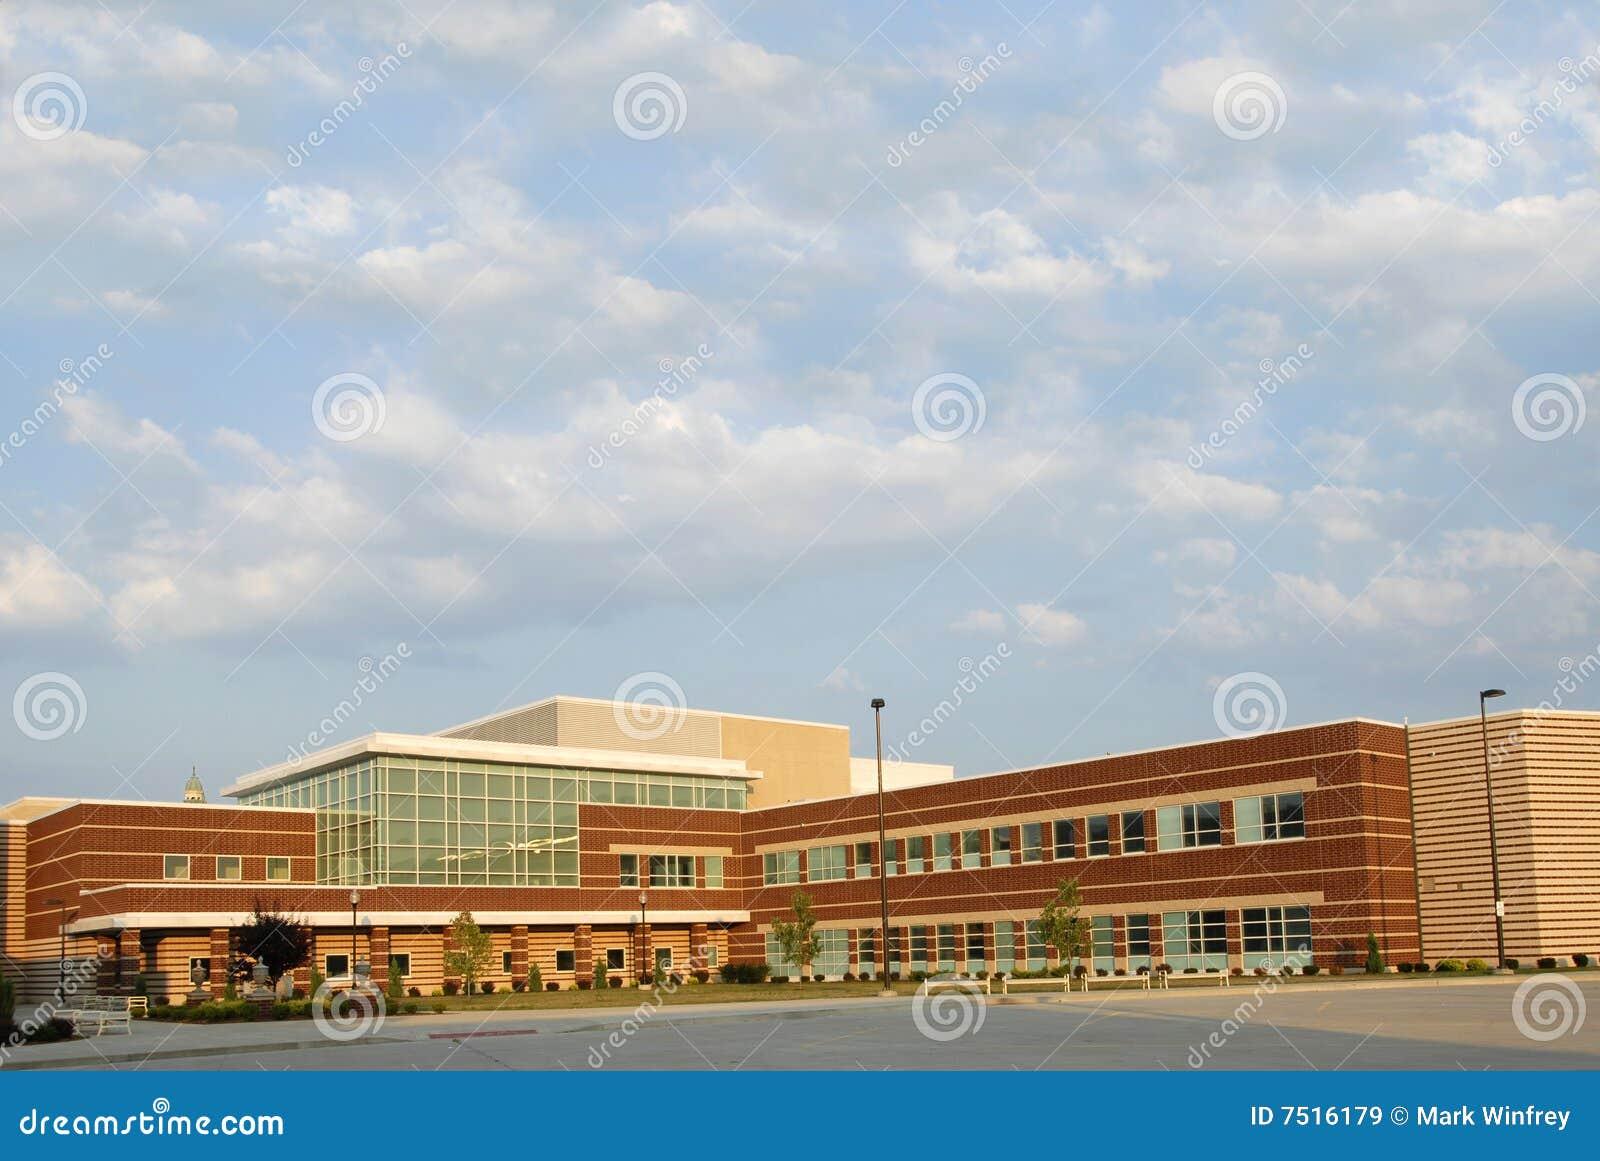 Bâtiment scolaire neuf